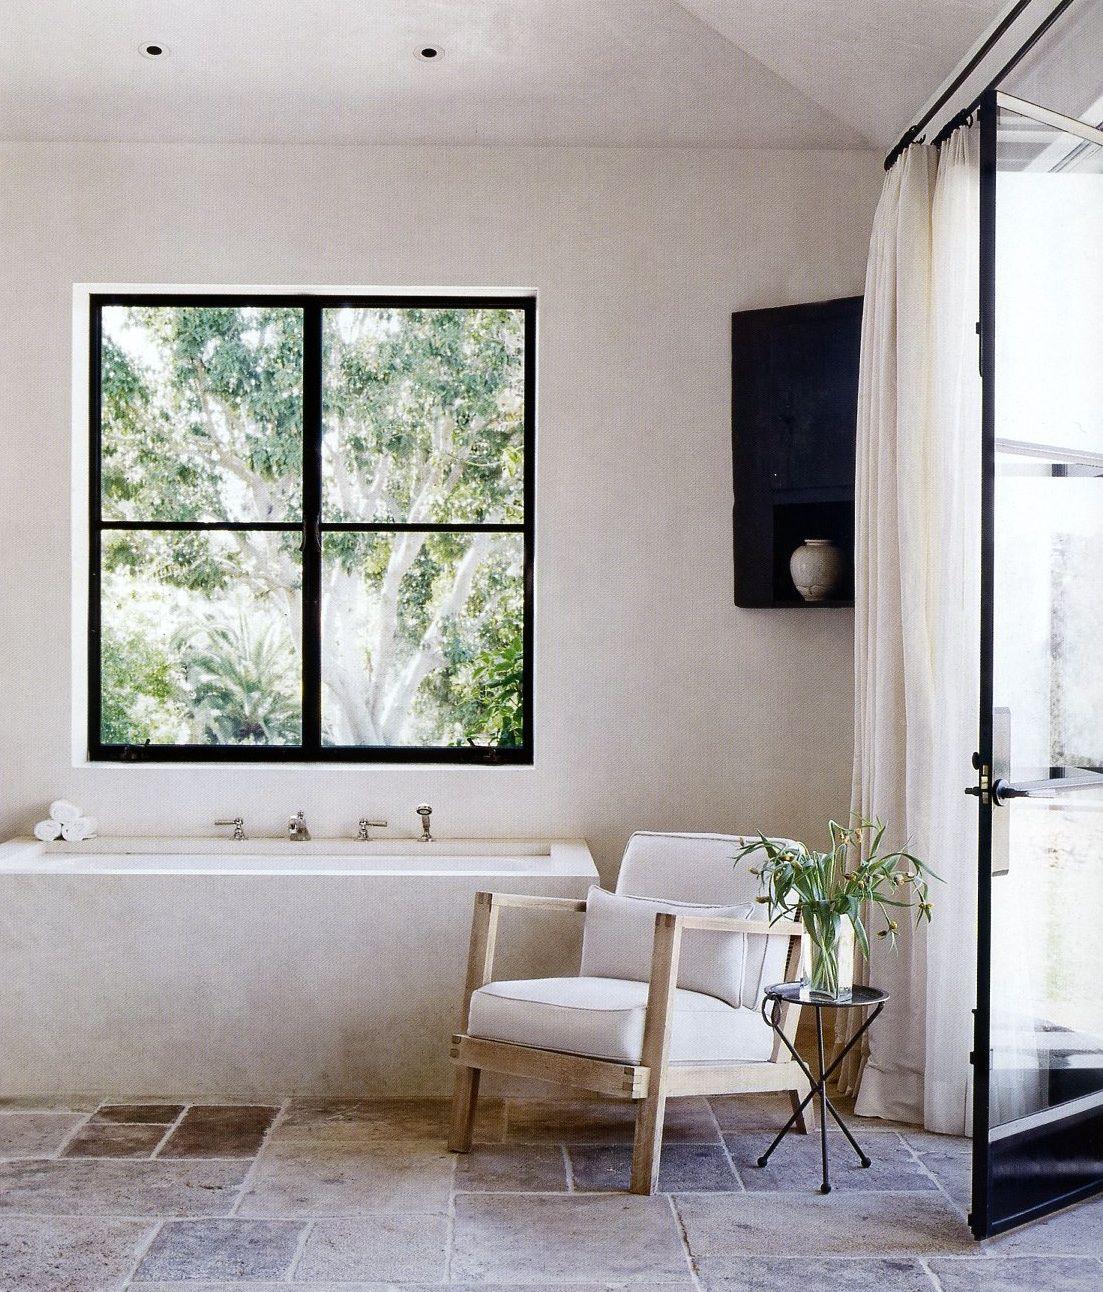 Rustic Bathroom Black Window Frames House Interior Home